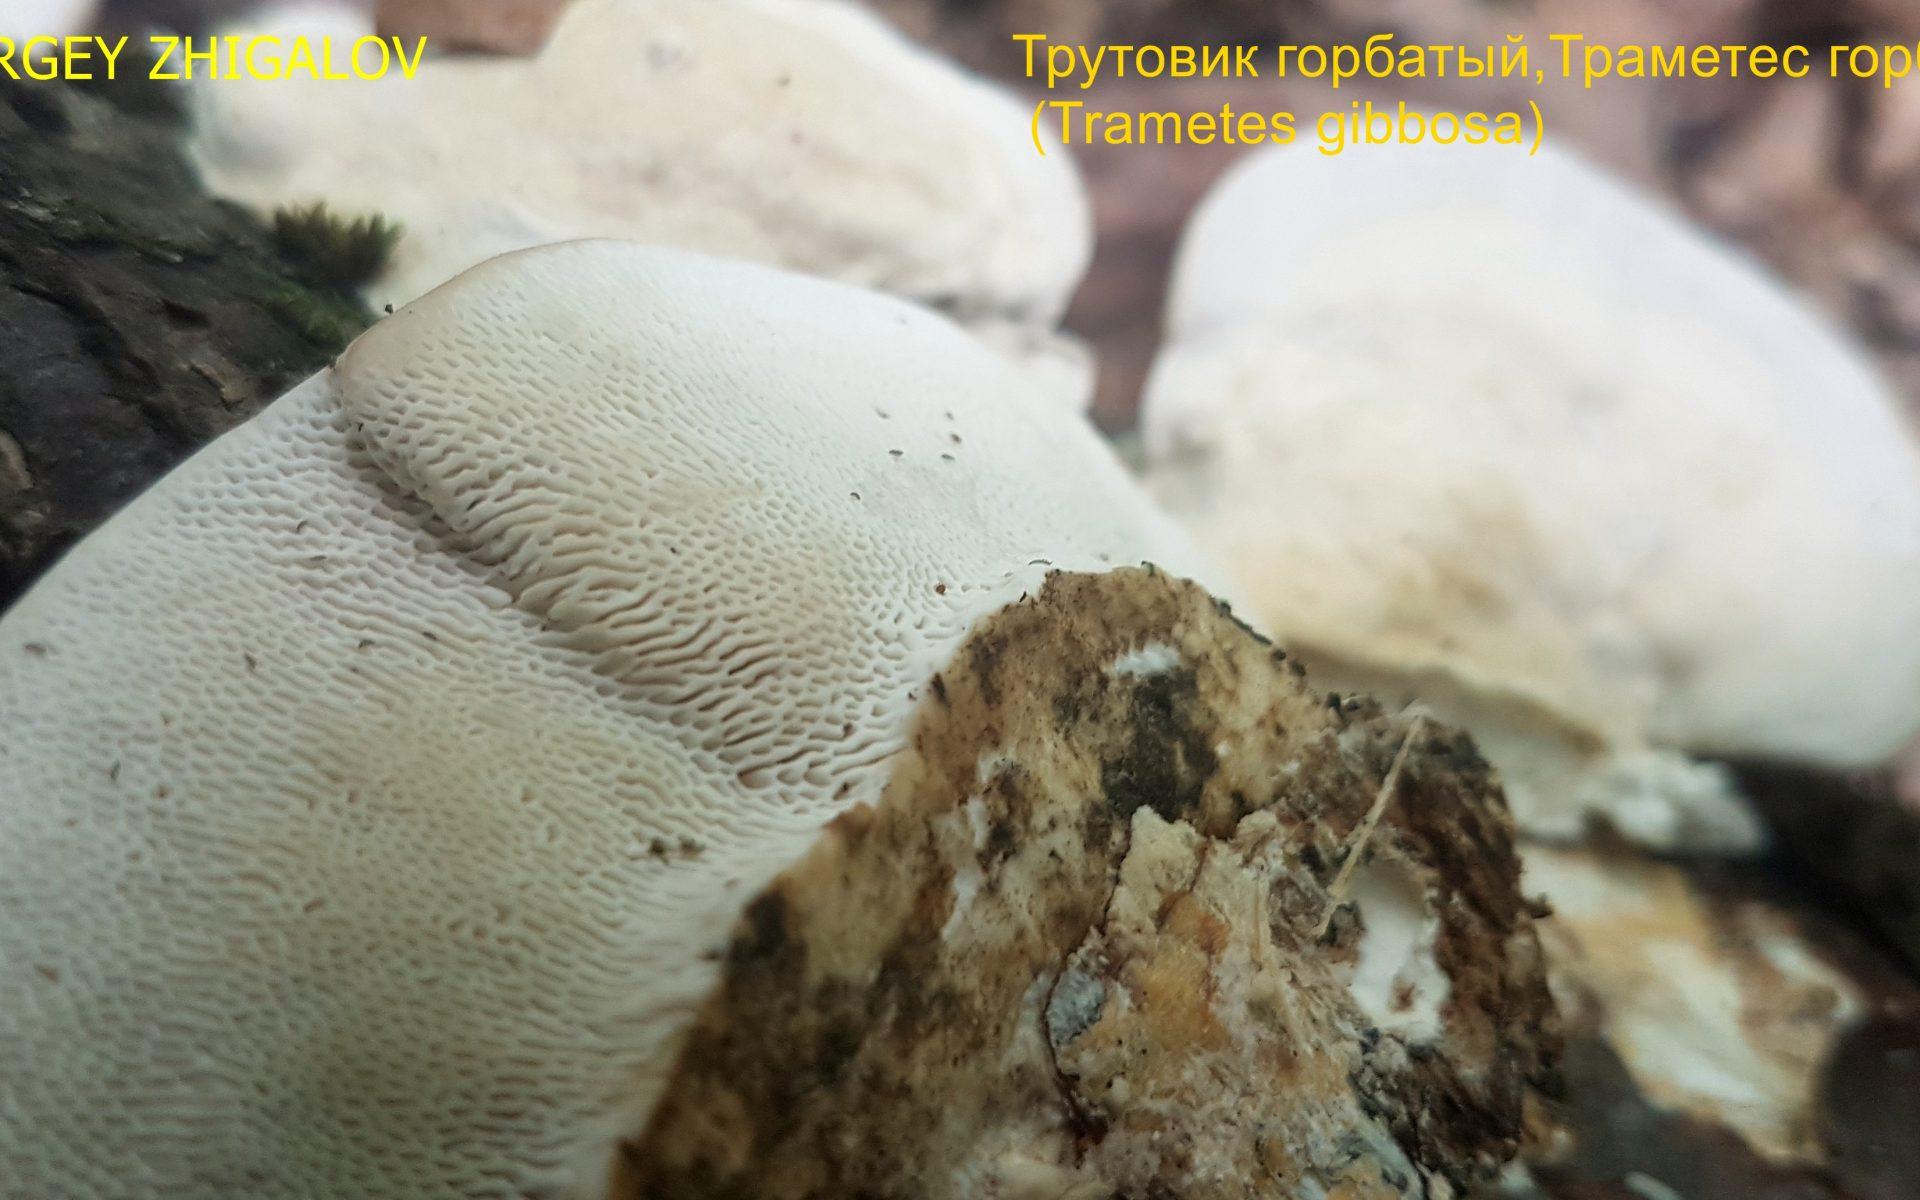 Траметес горбатый Trametes gibbosa